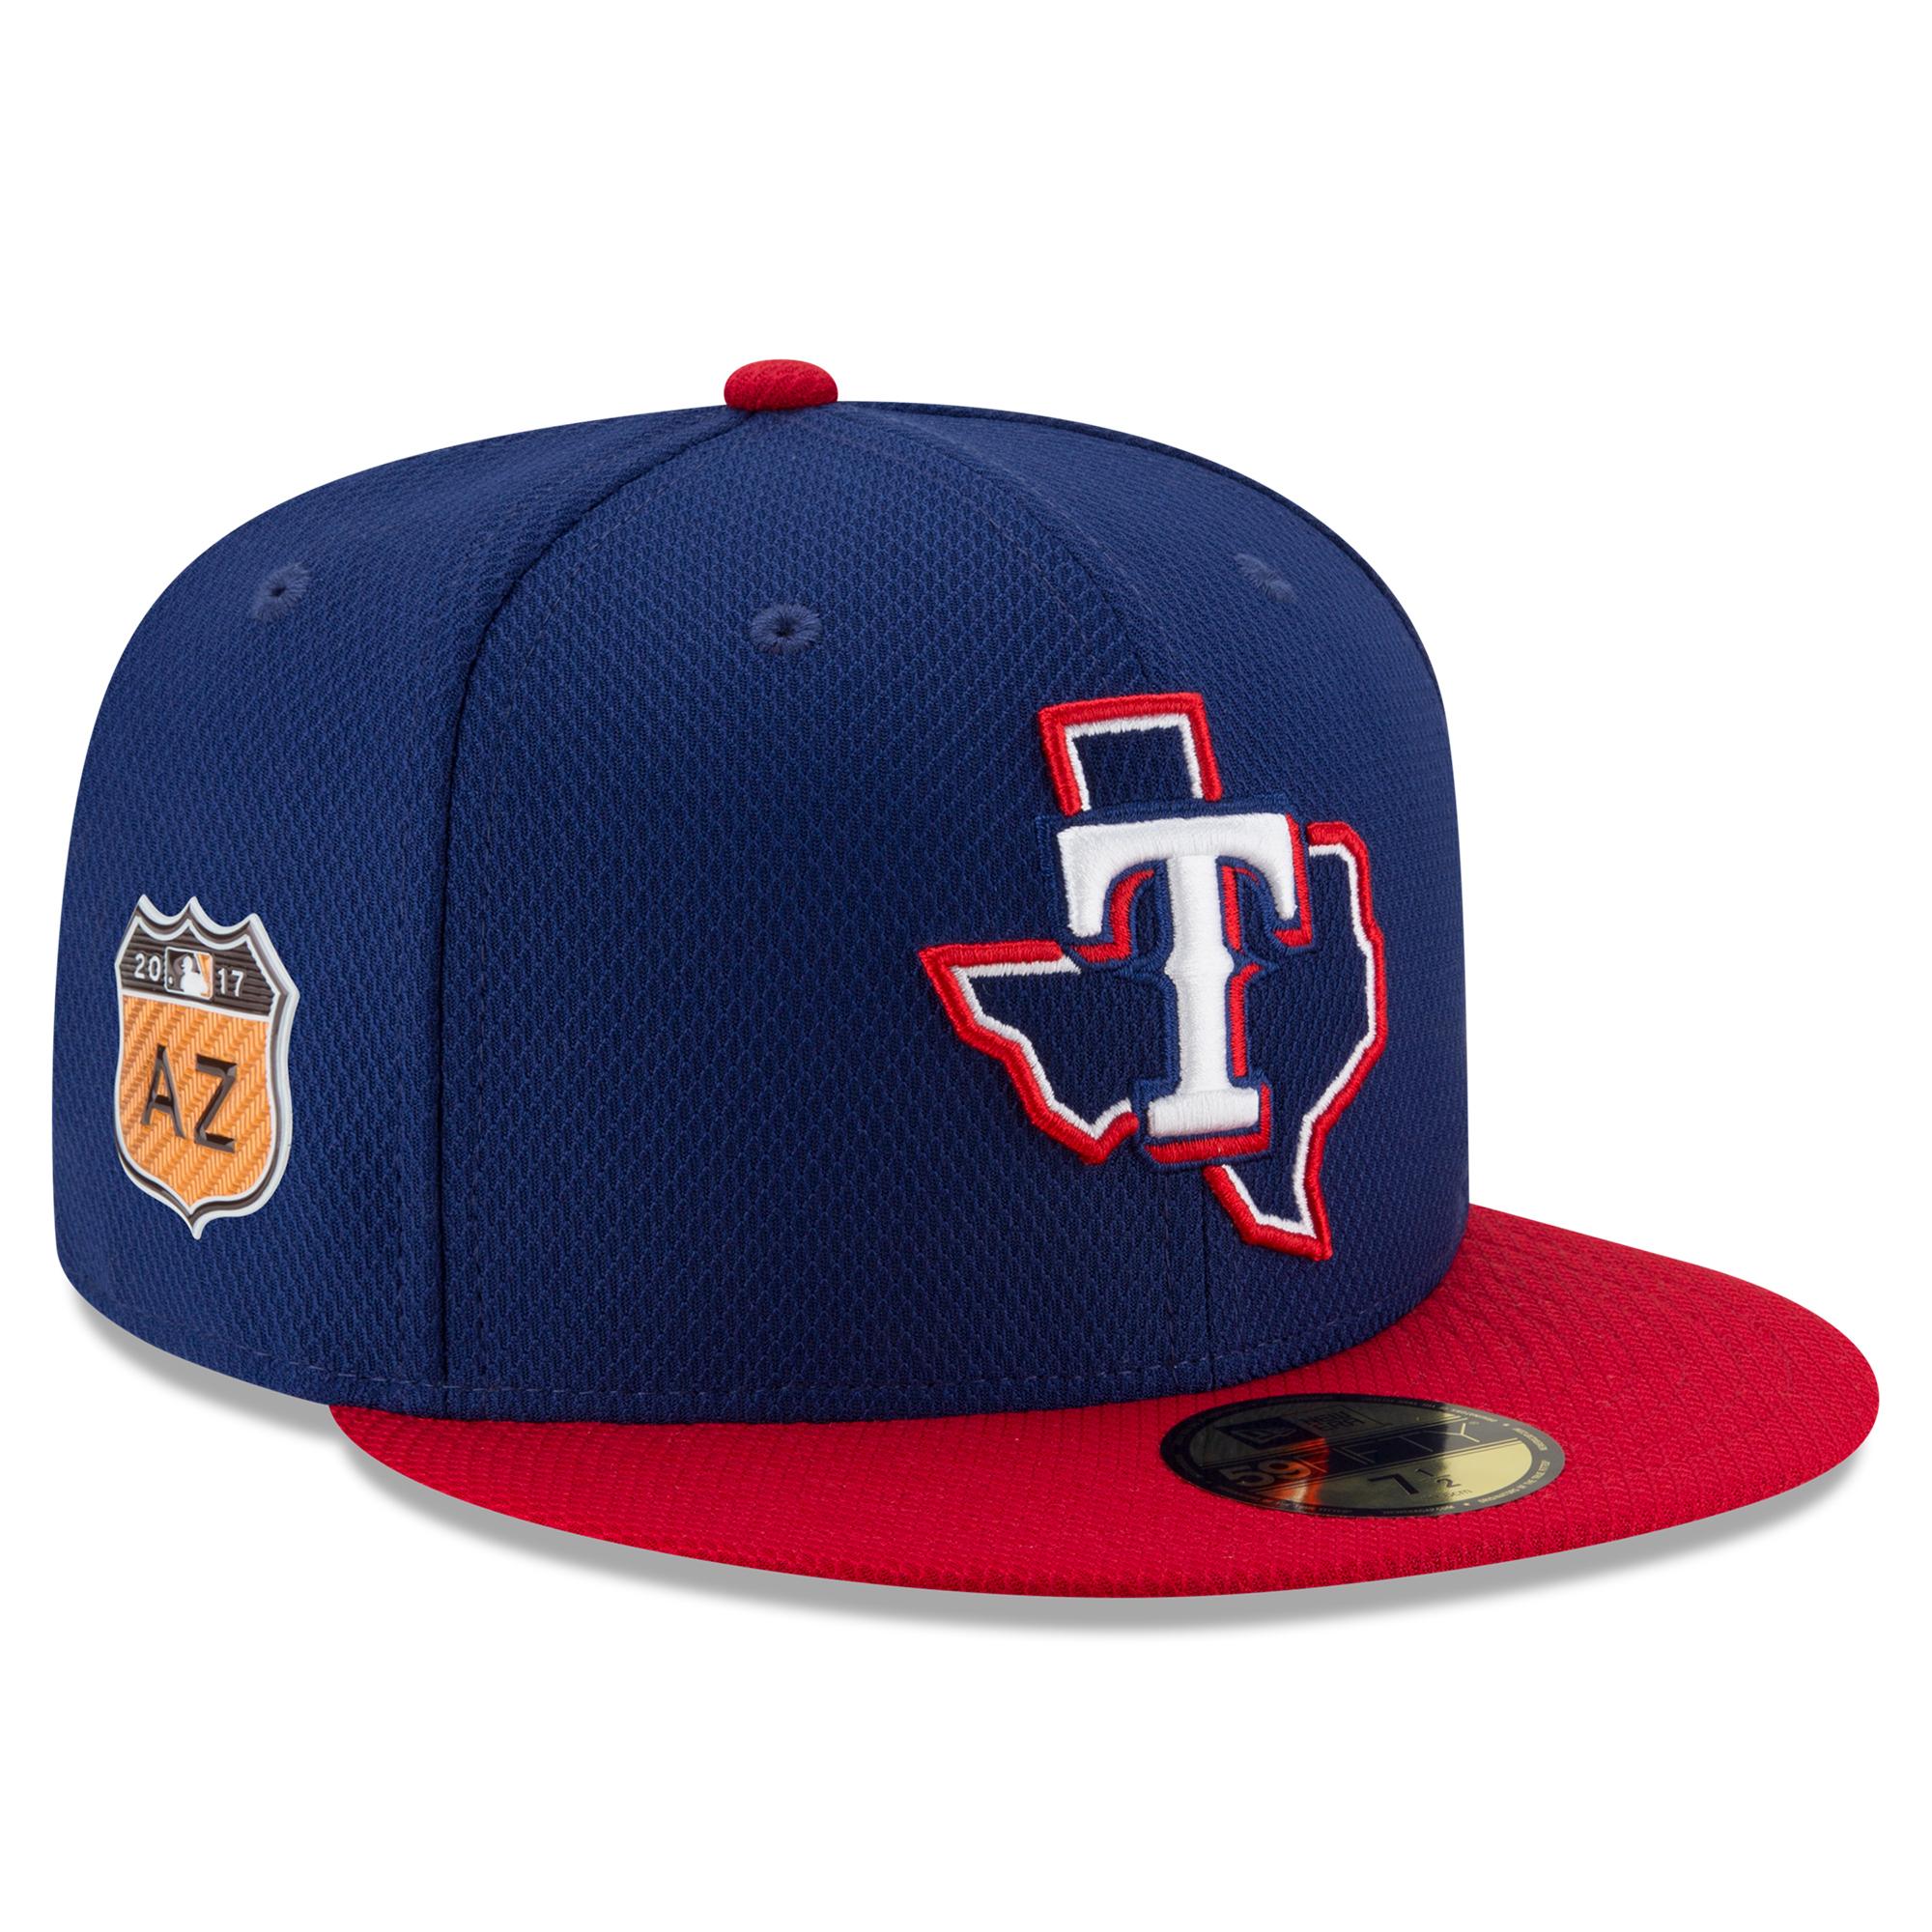 Texas Rangers New Era 2017 Spring Training Diamond Era 59FIFTY Fitted Hat - Royal